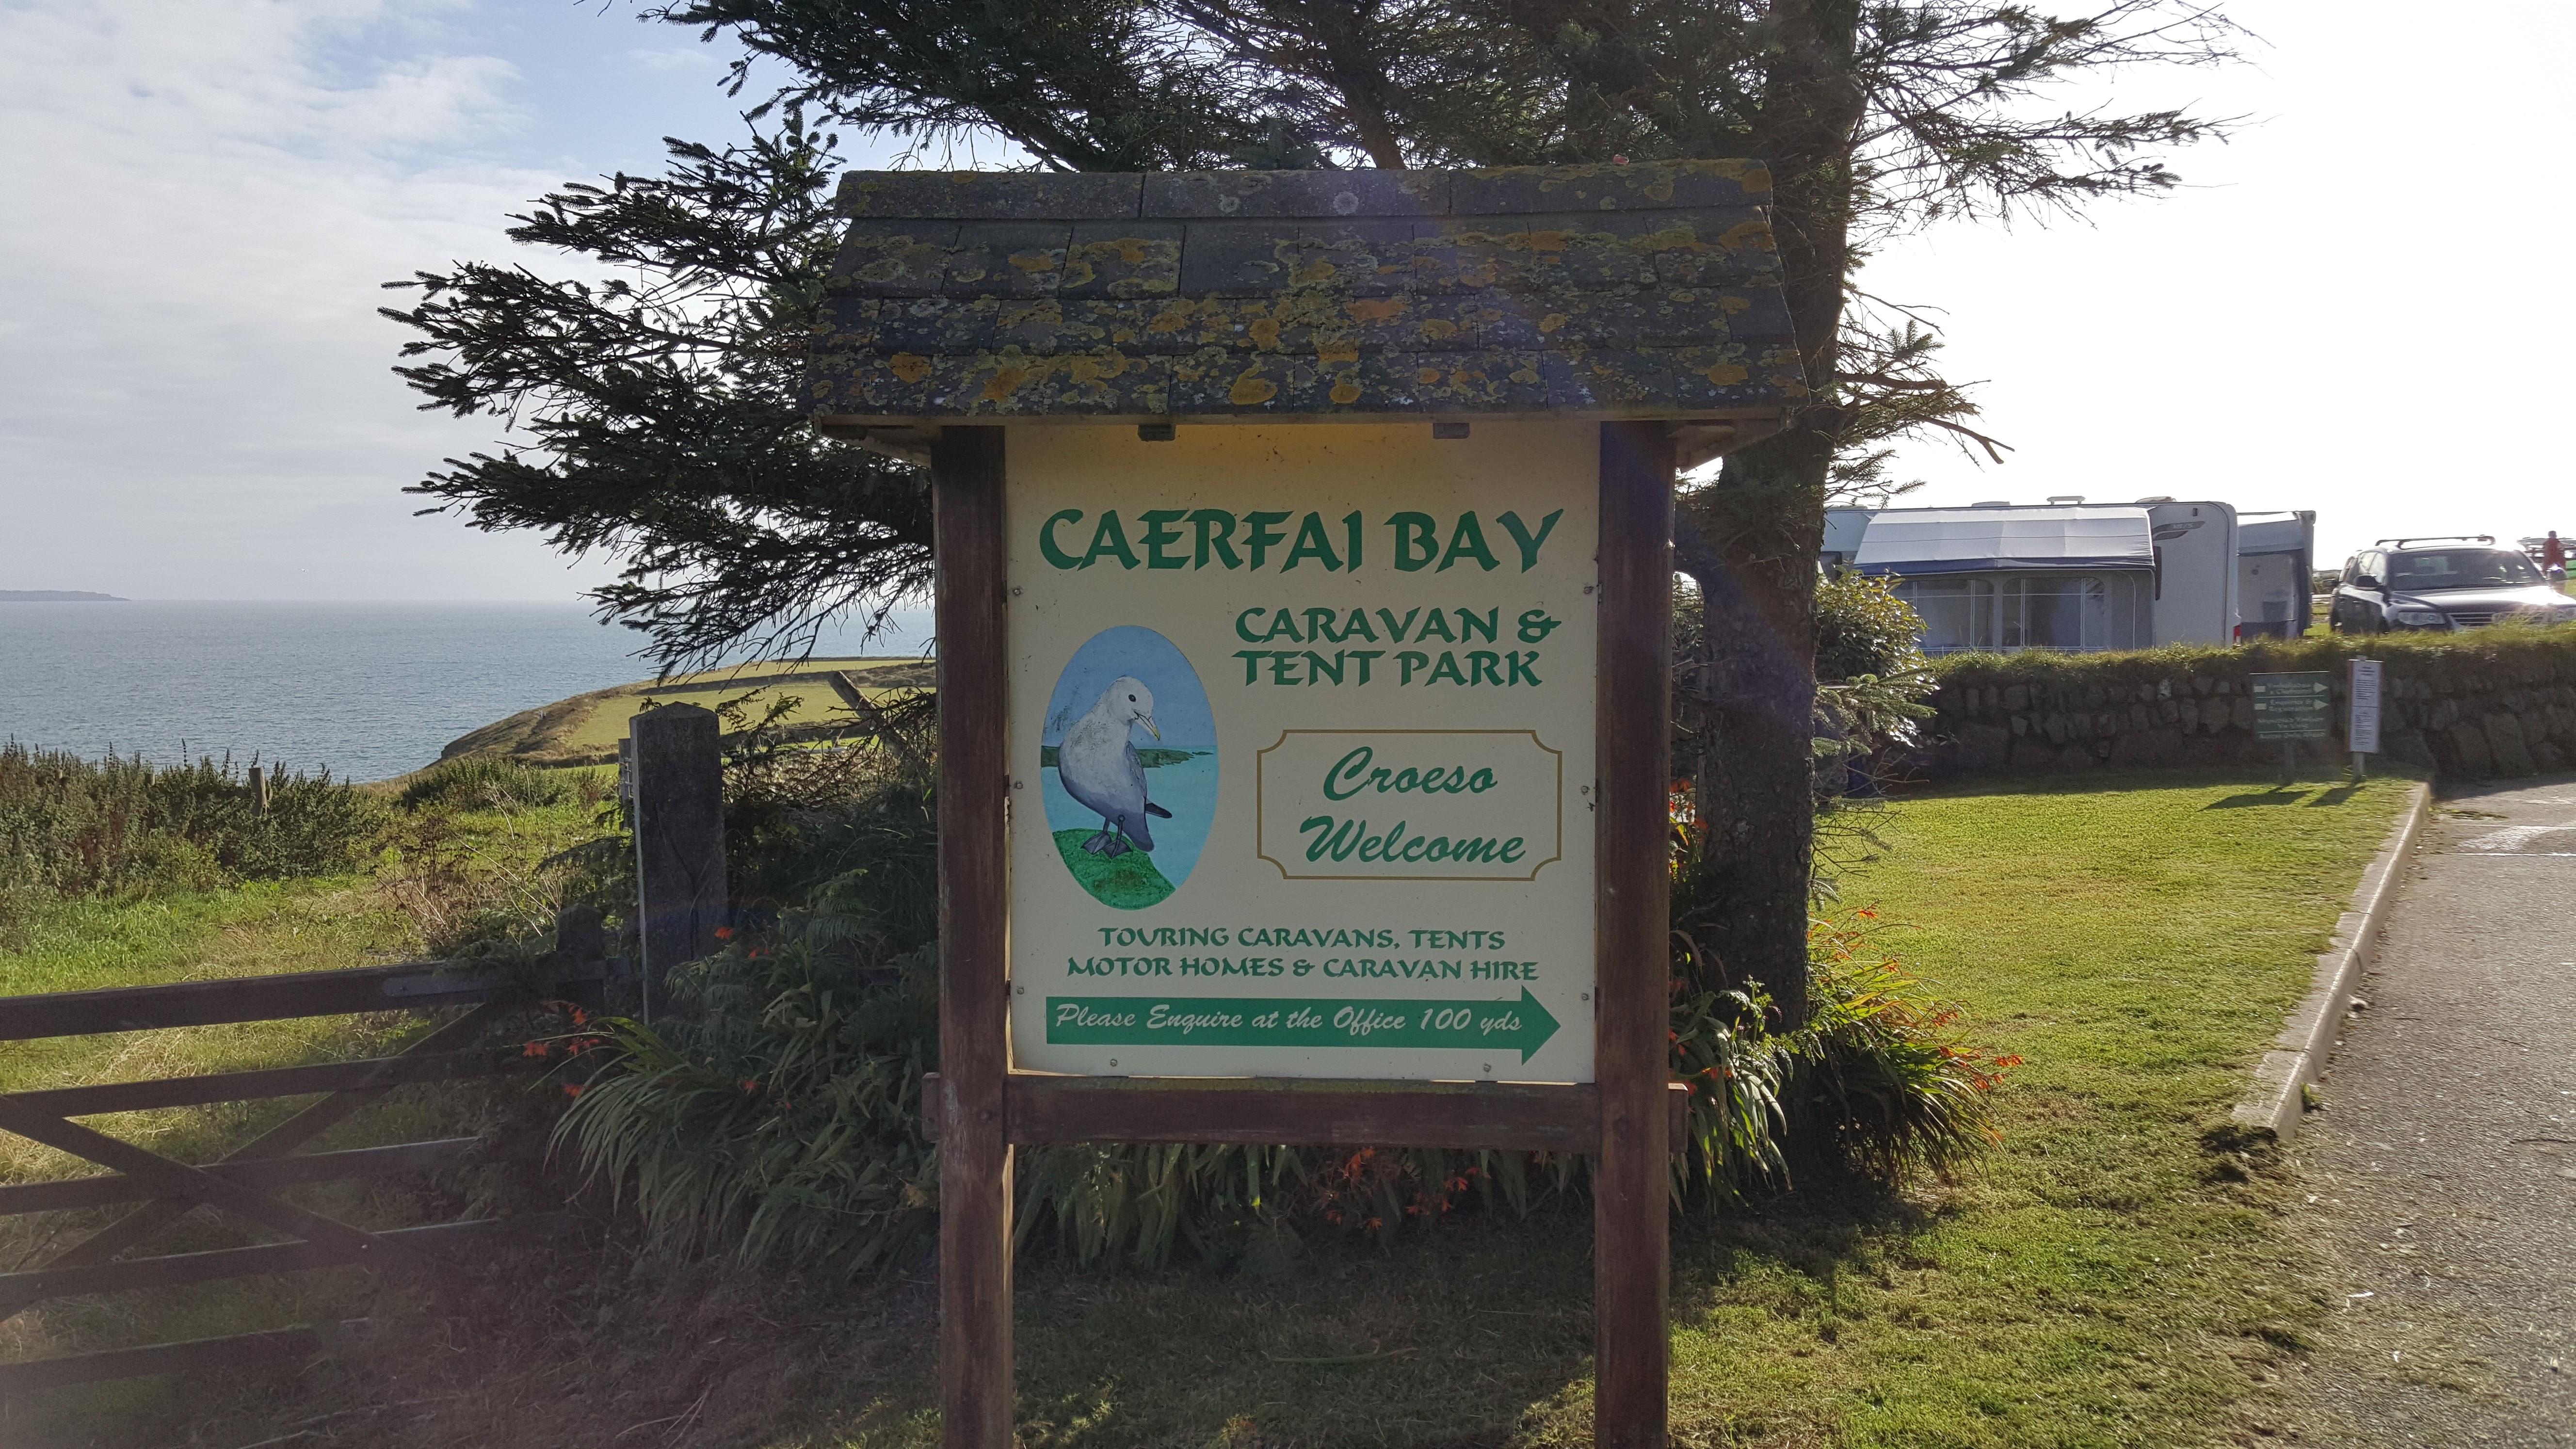 Welcome to Caerfai Bay